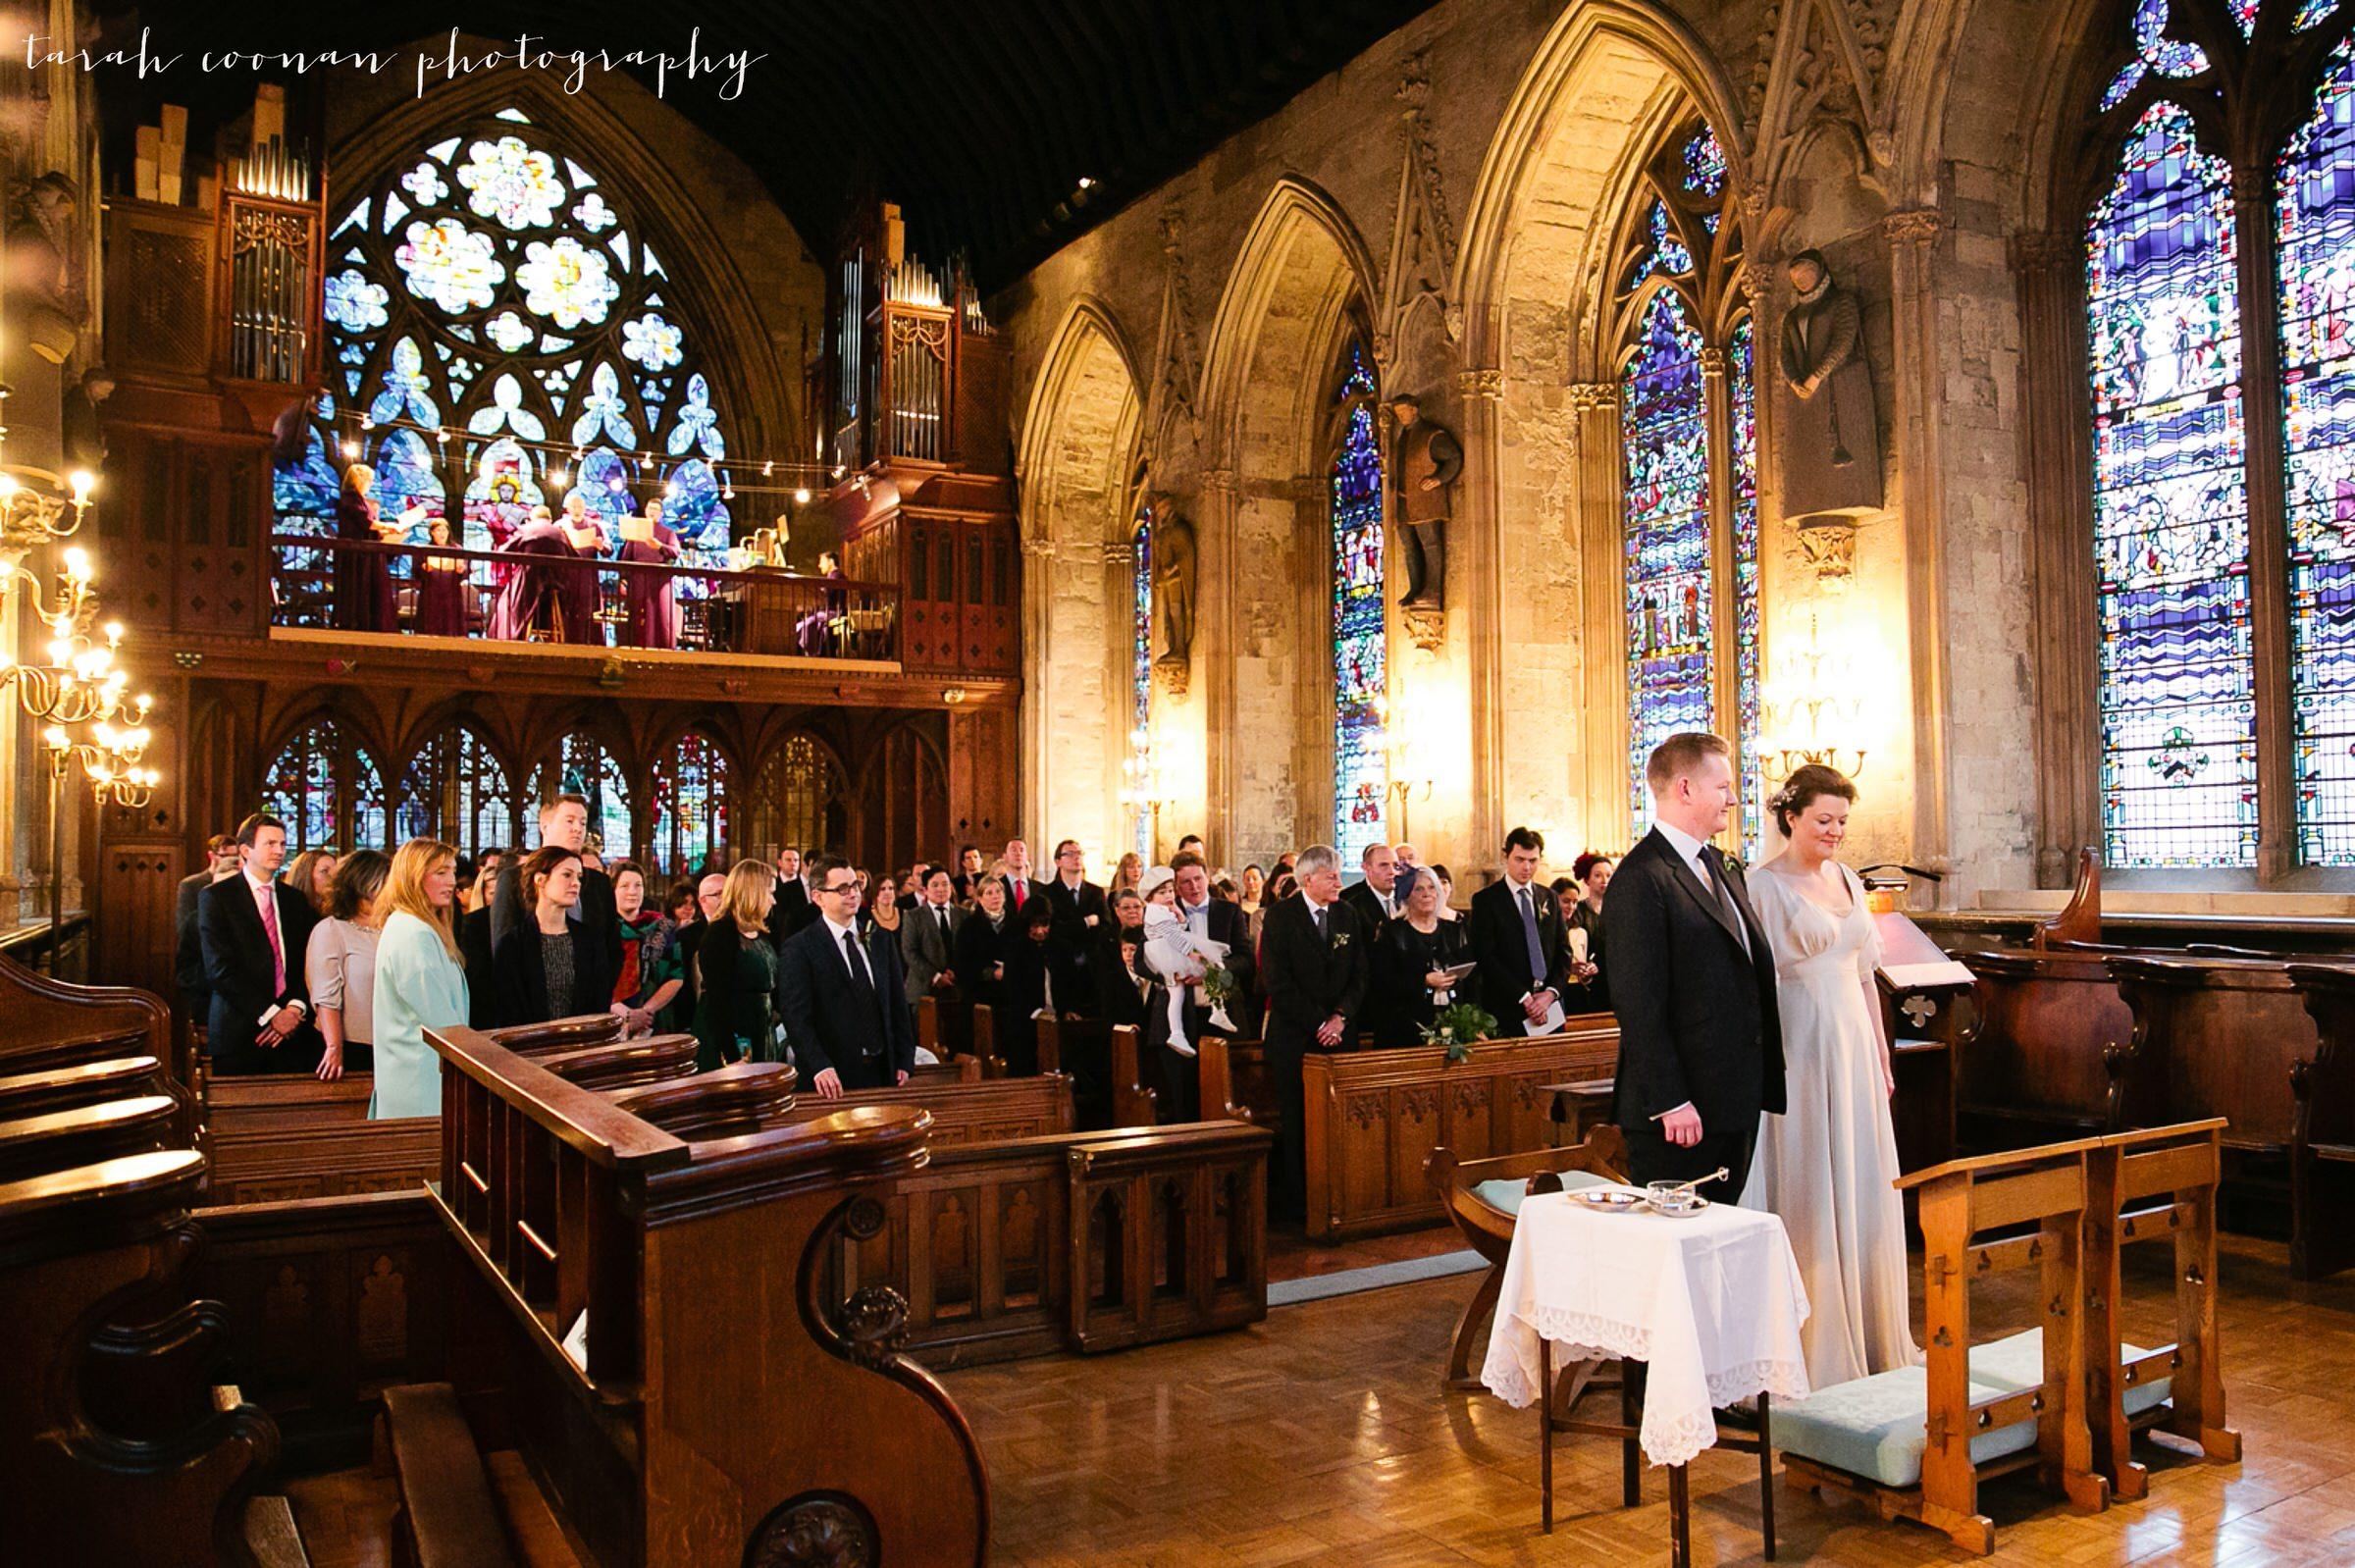 brighton-wedding-photographer14